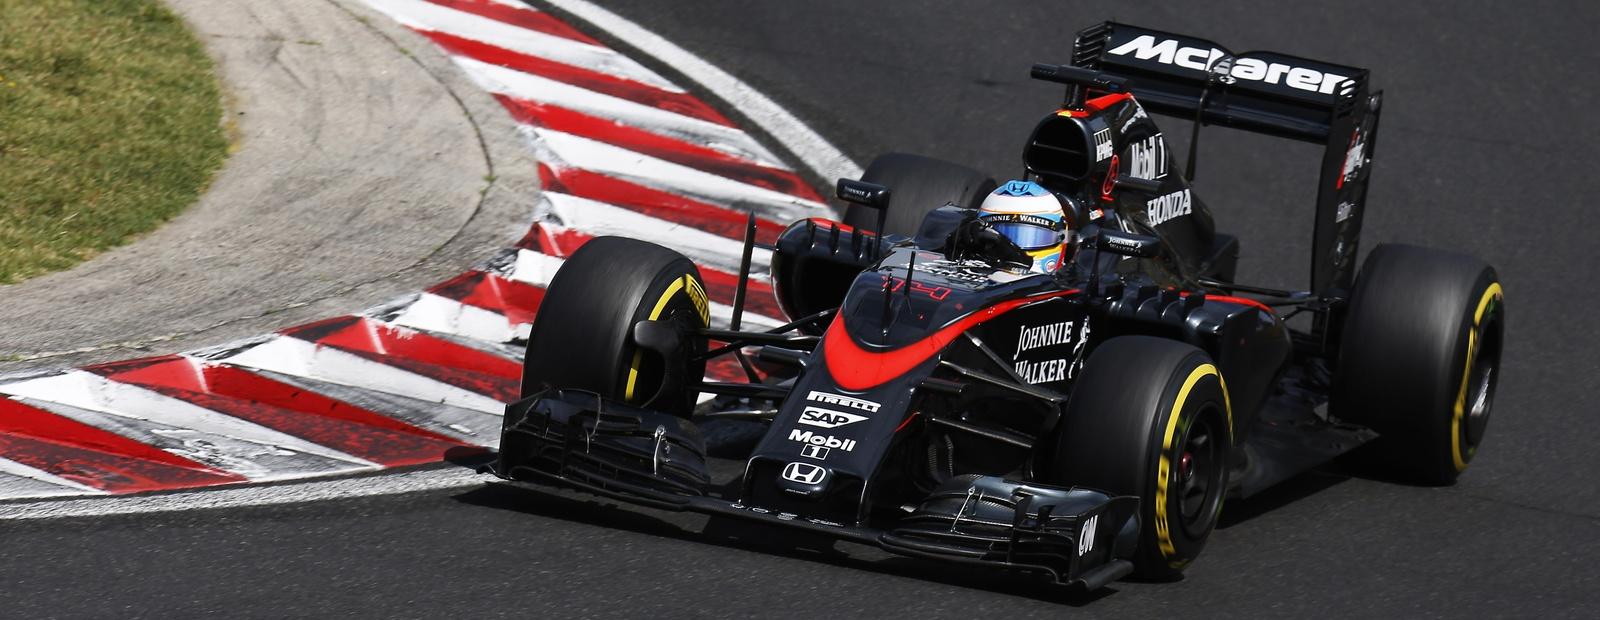 mclaren formula 1 - 2015 hungarian grand prix race report